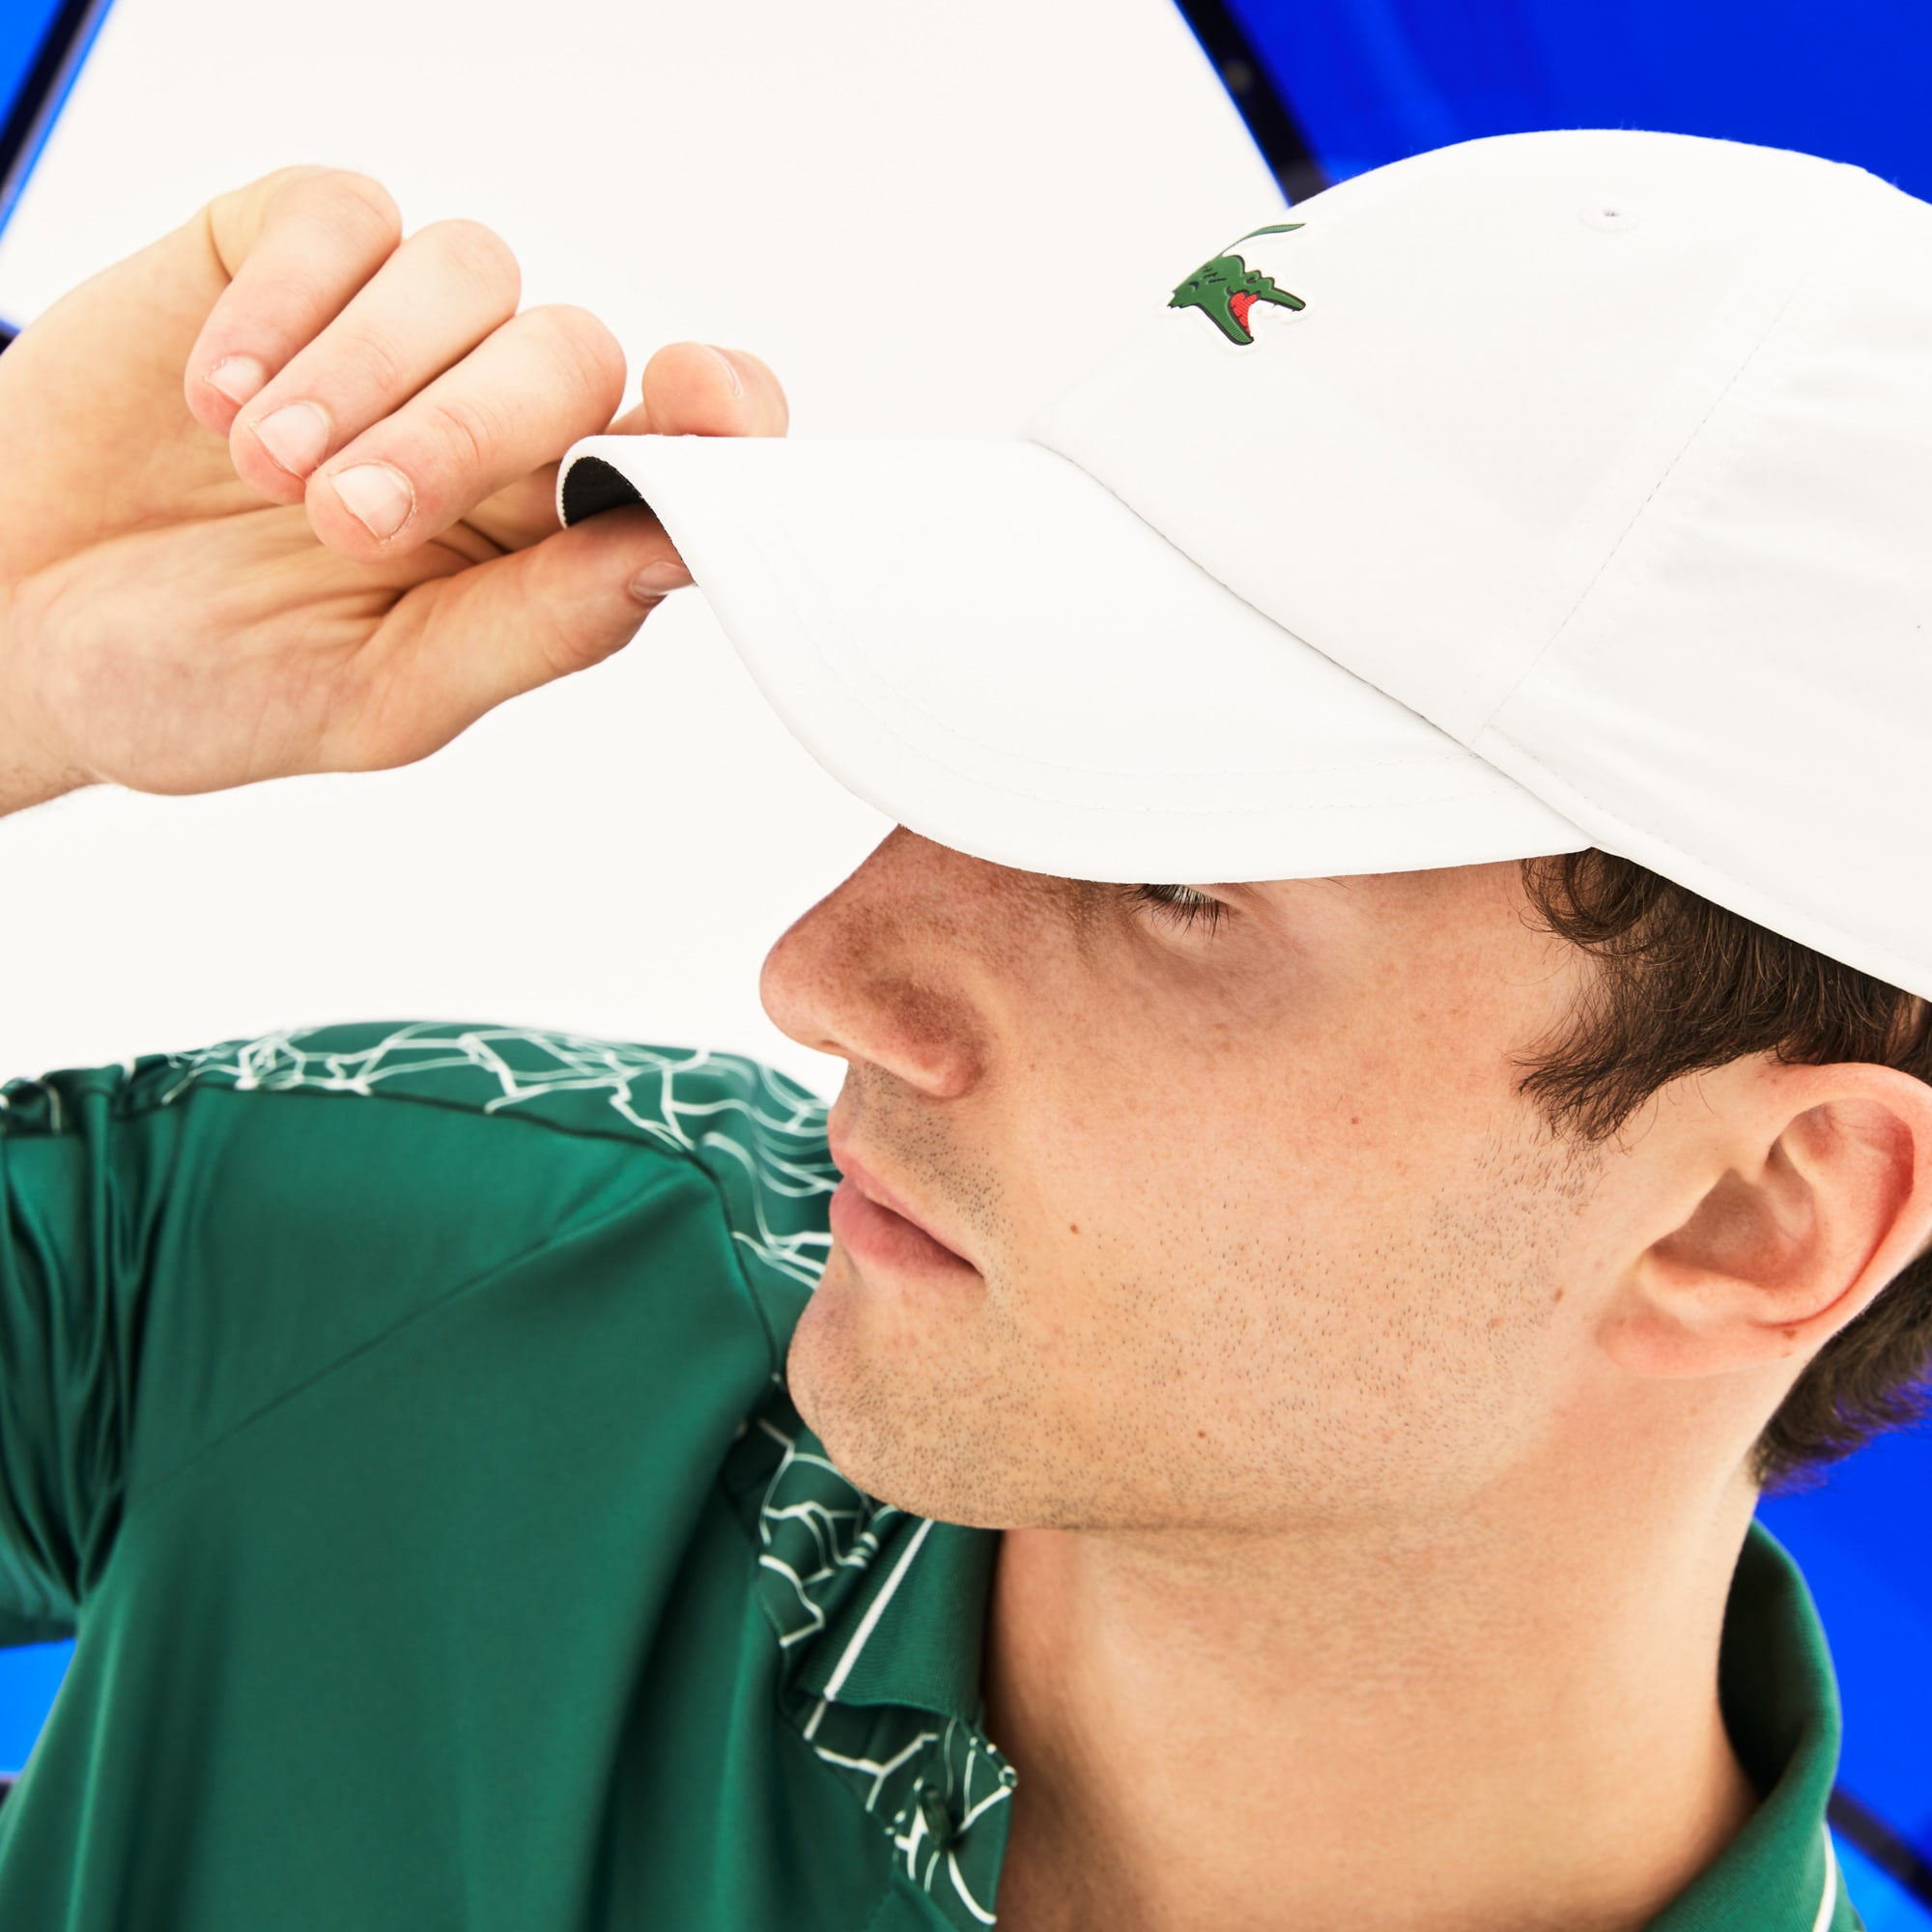 Lacoste SPORT系列诺瓦克·德约科维奇(NOVAK DJOKOVIC)合作款球场系列微纤维帽